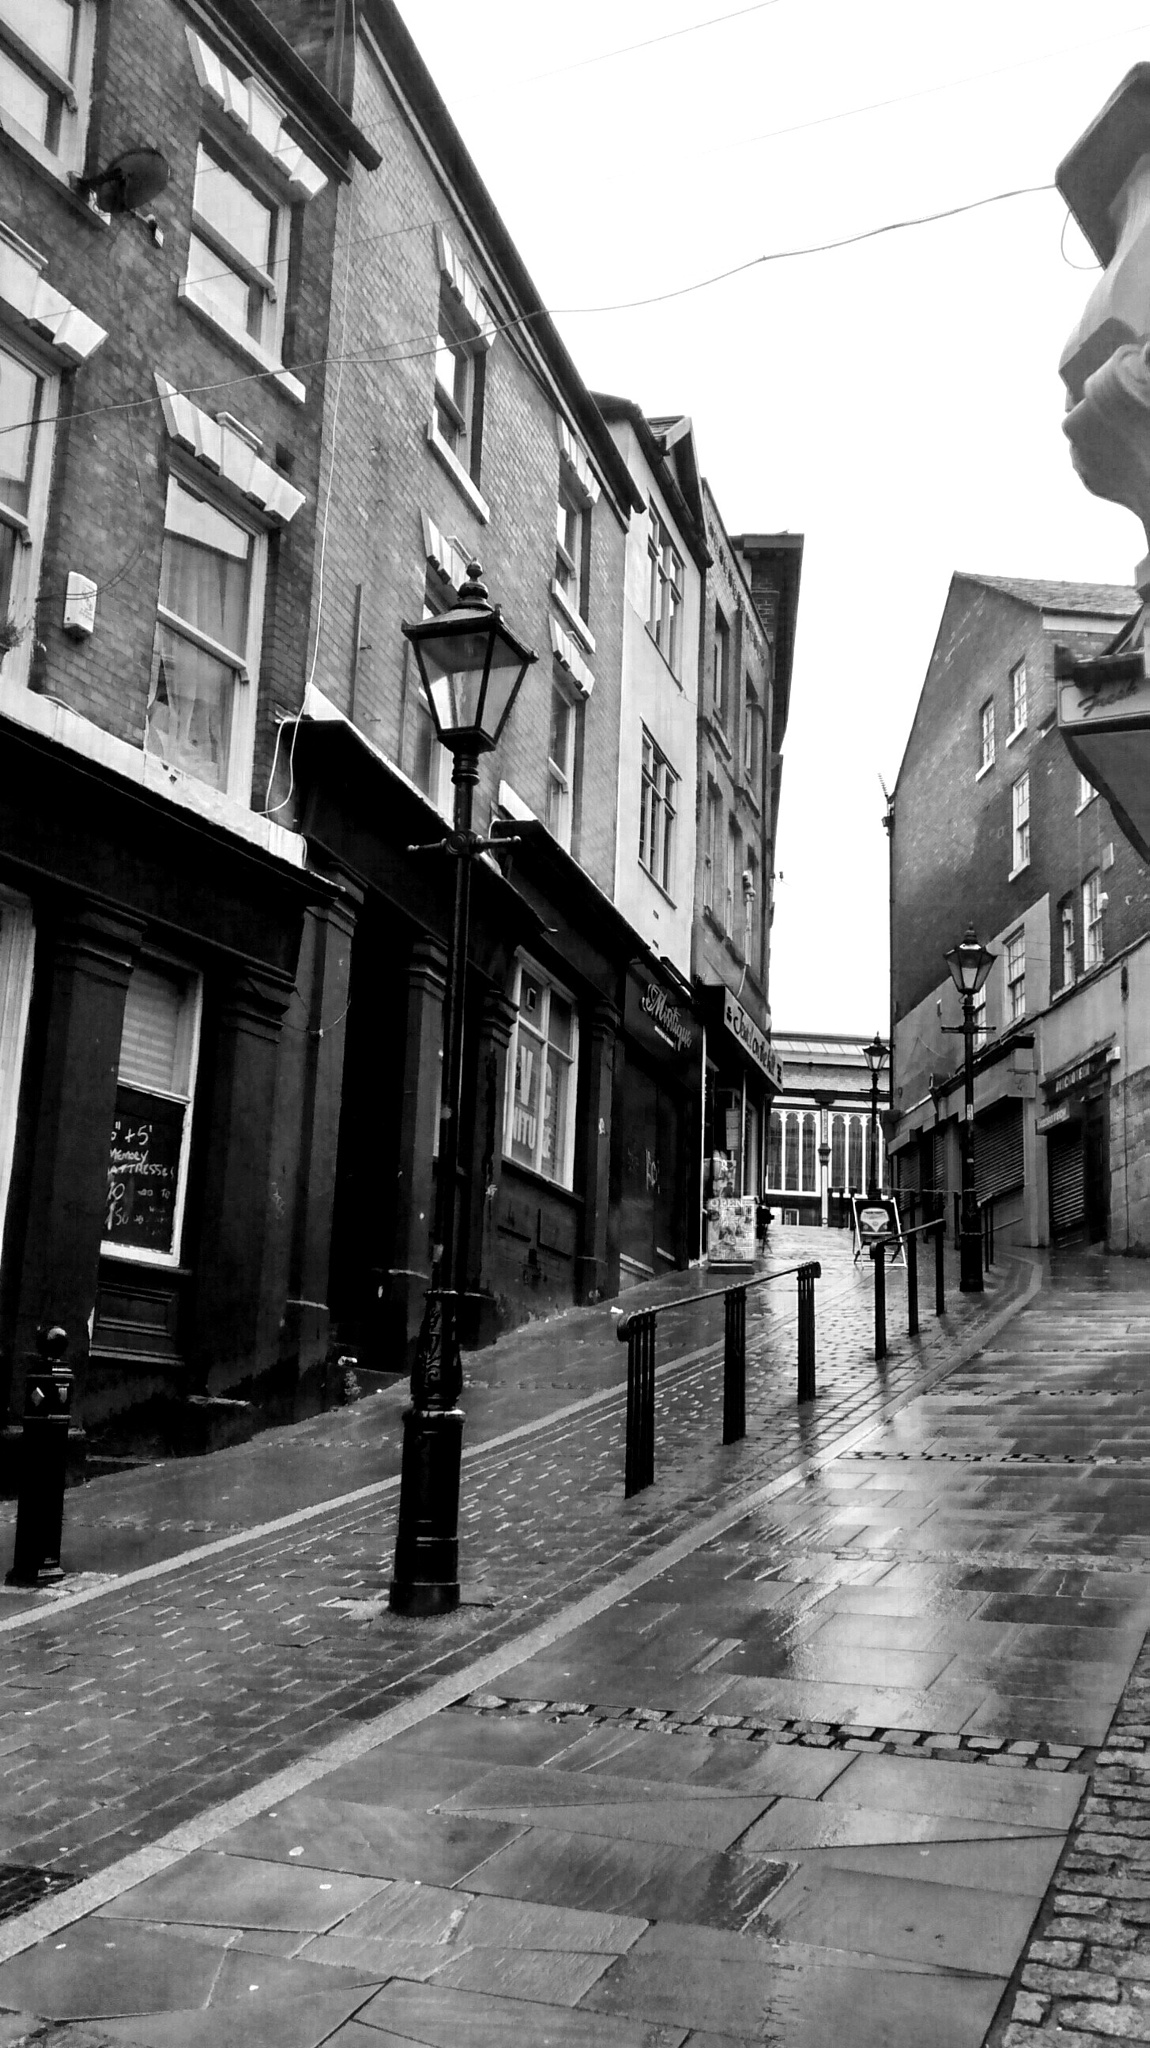 Stockport Cheshire UK by dysonjohn64